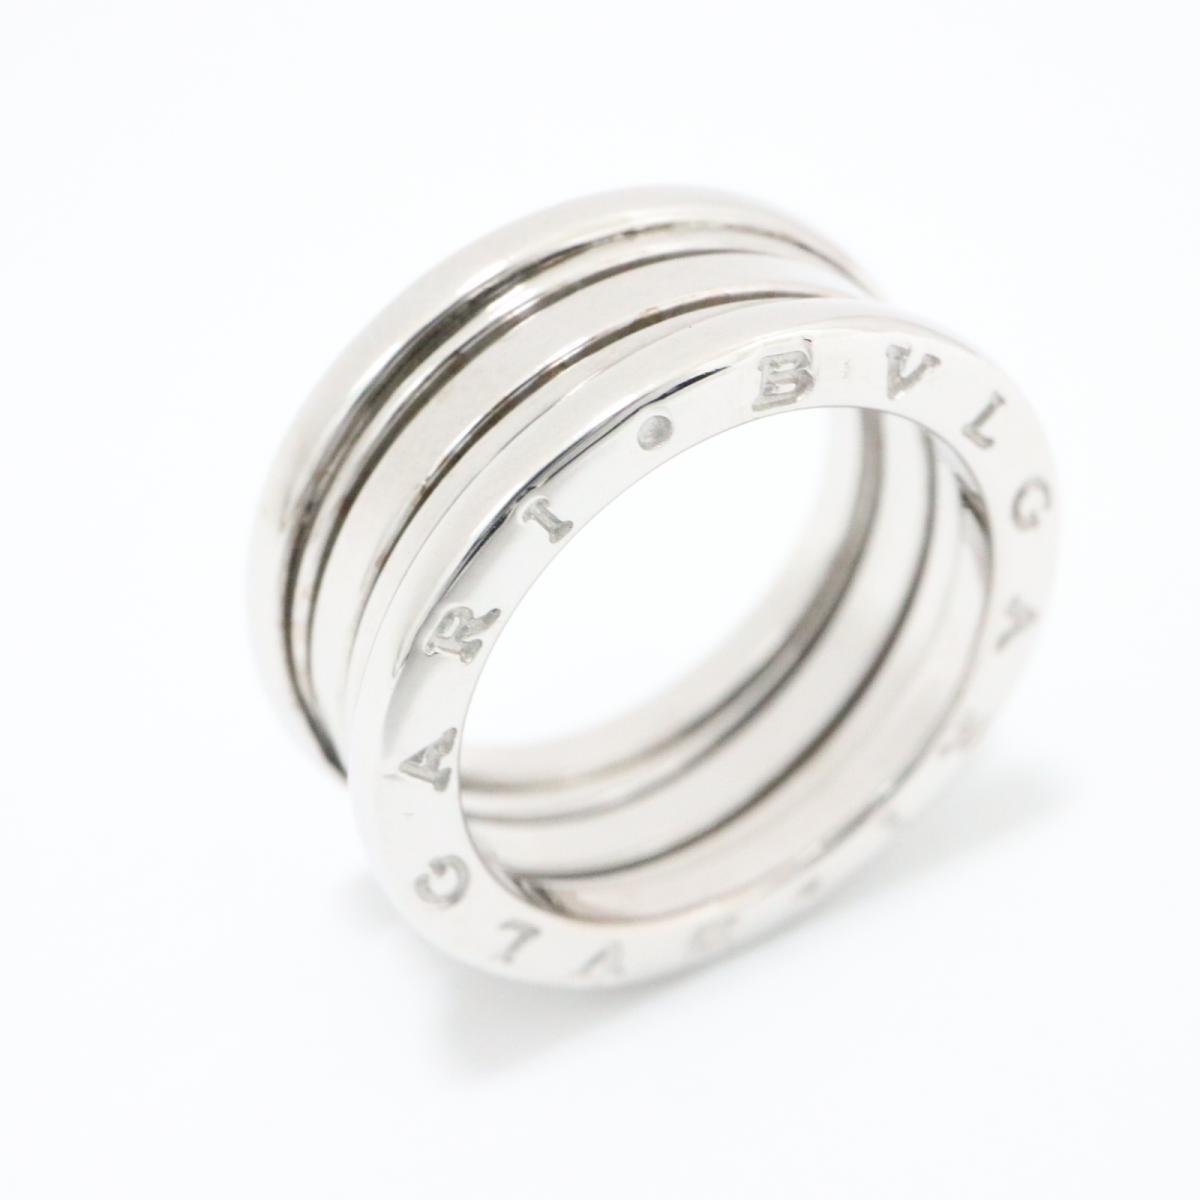 c0ac77d7b6c5 中古】 ブルガリ B-zero1 リング Sサイズ 指輪 メンズ レディース K18WG ...